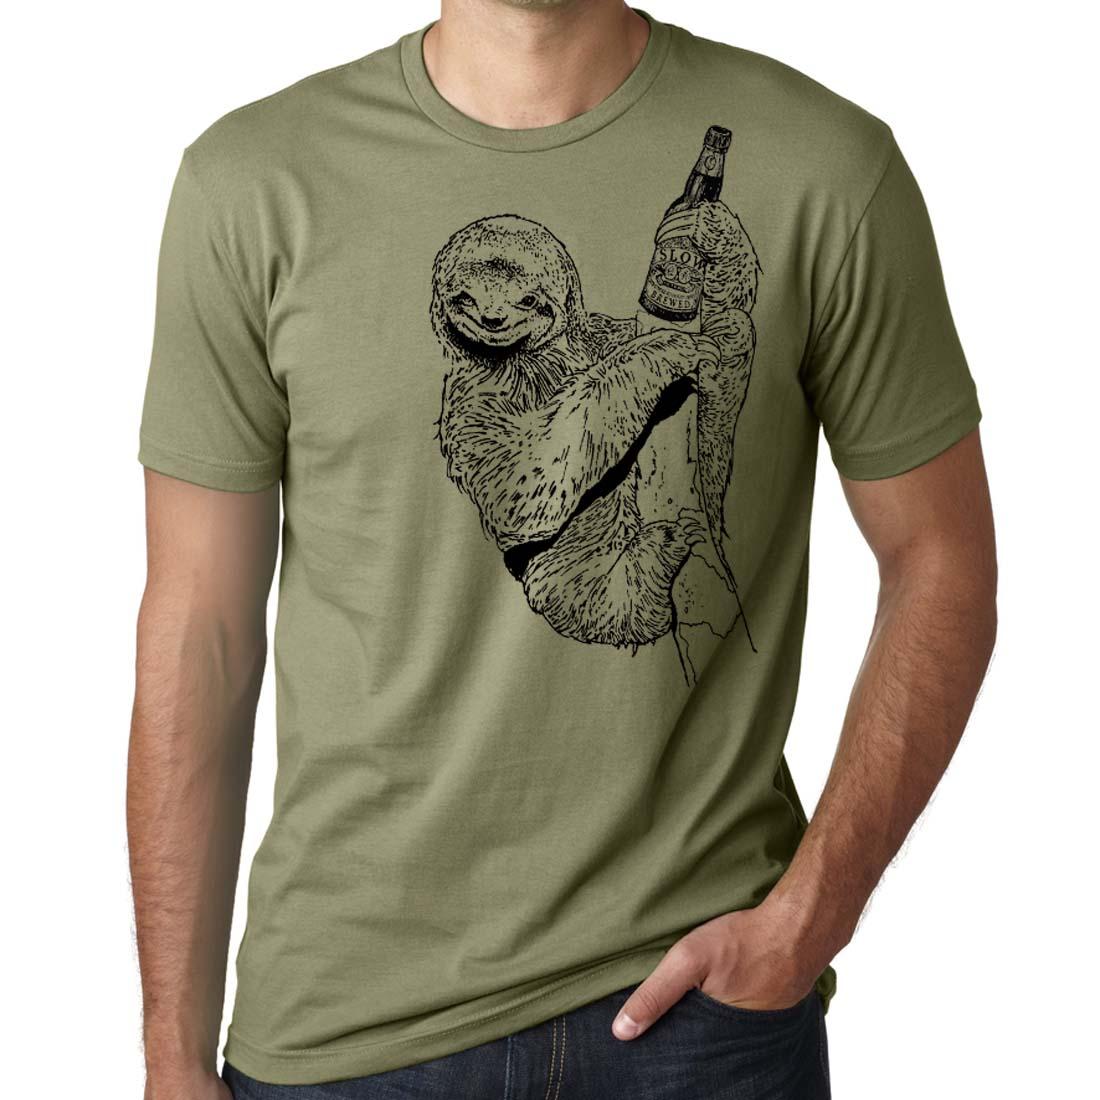 8e469b90 Craft Beer Spirit Animals Graphic Tees